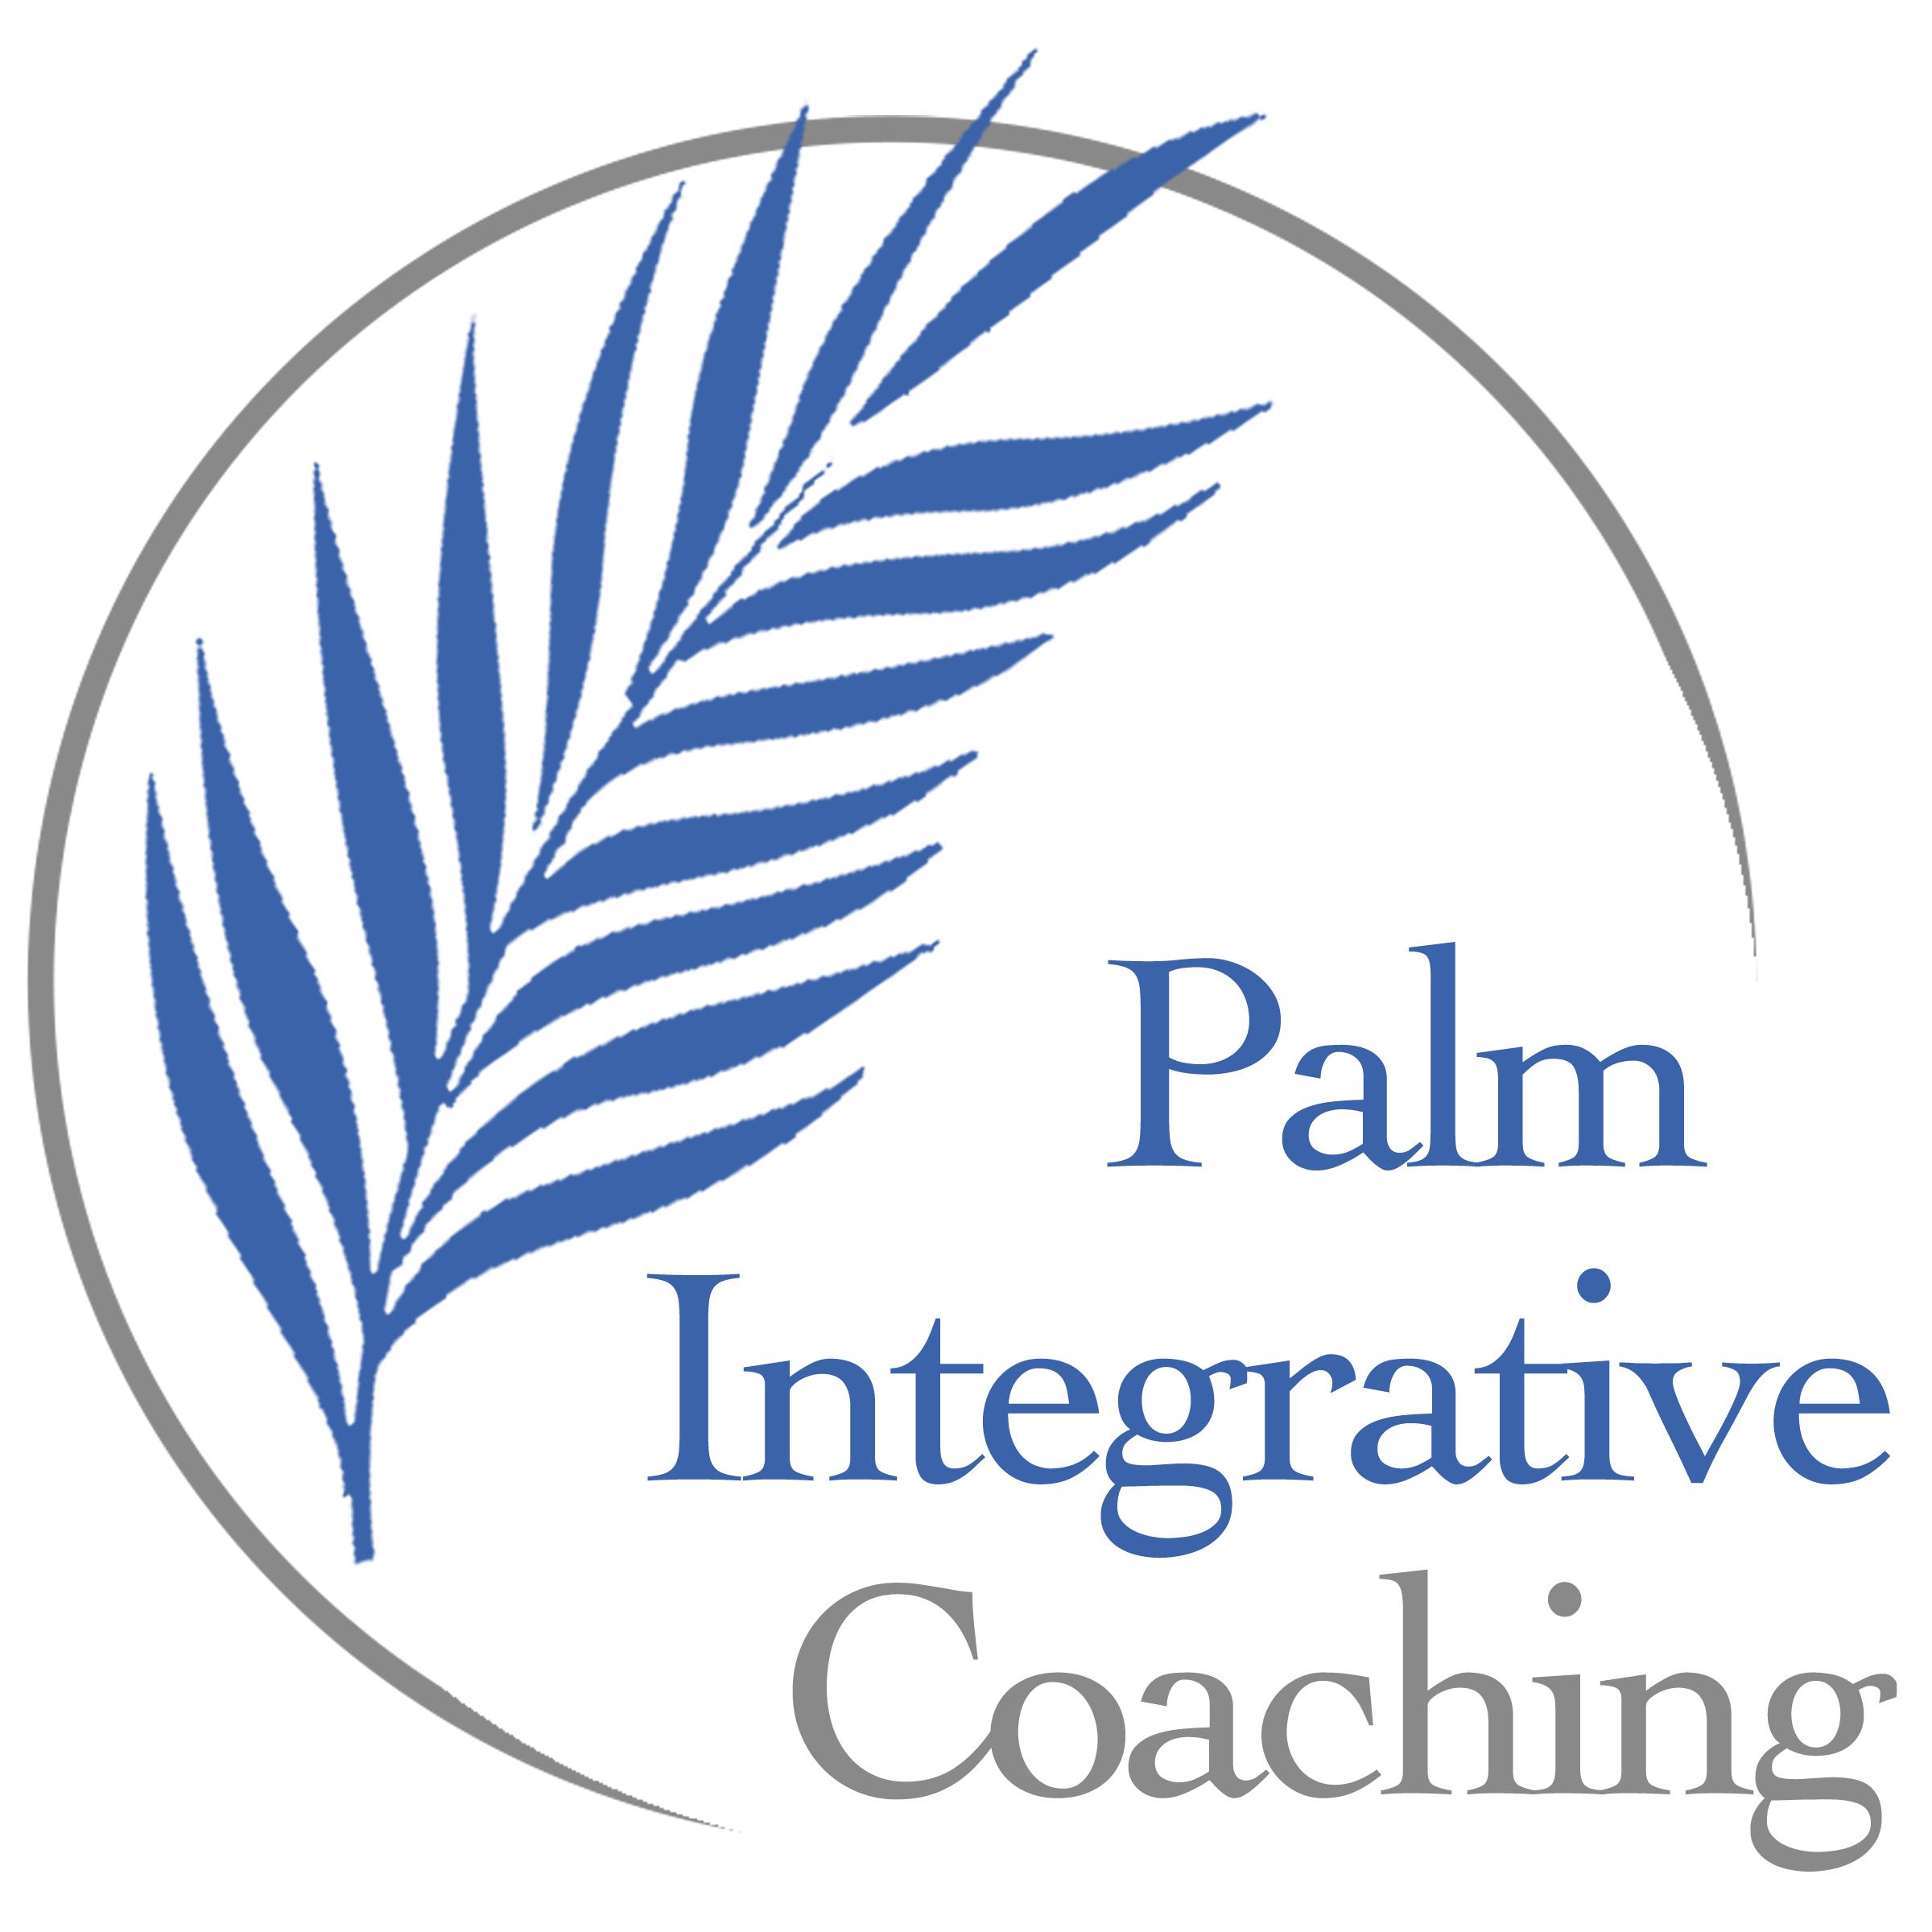 palm integrataive coaching logo image